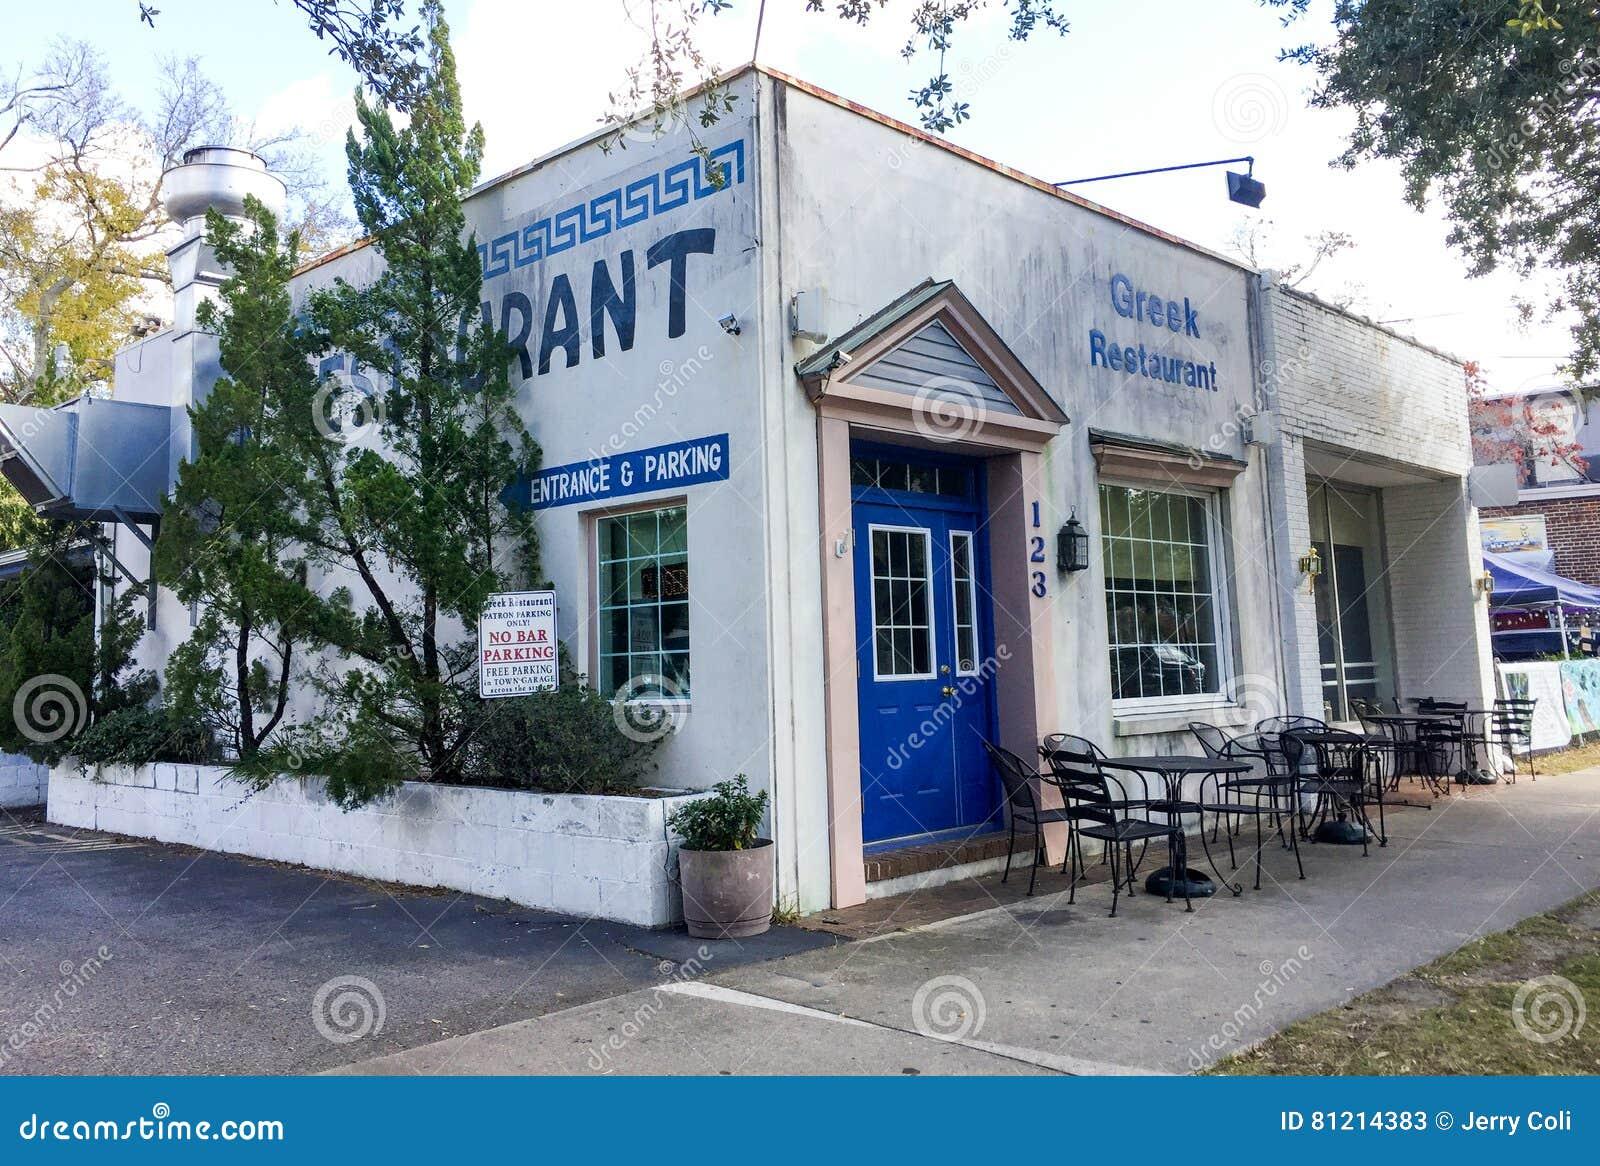 The Continental Corner restaurant